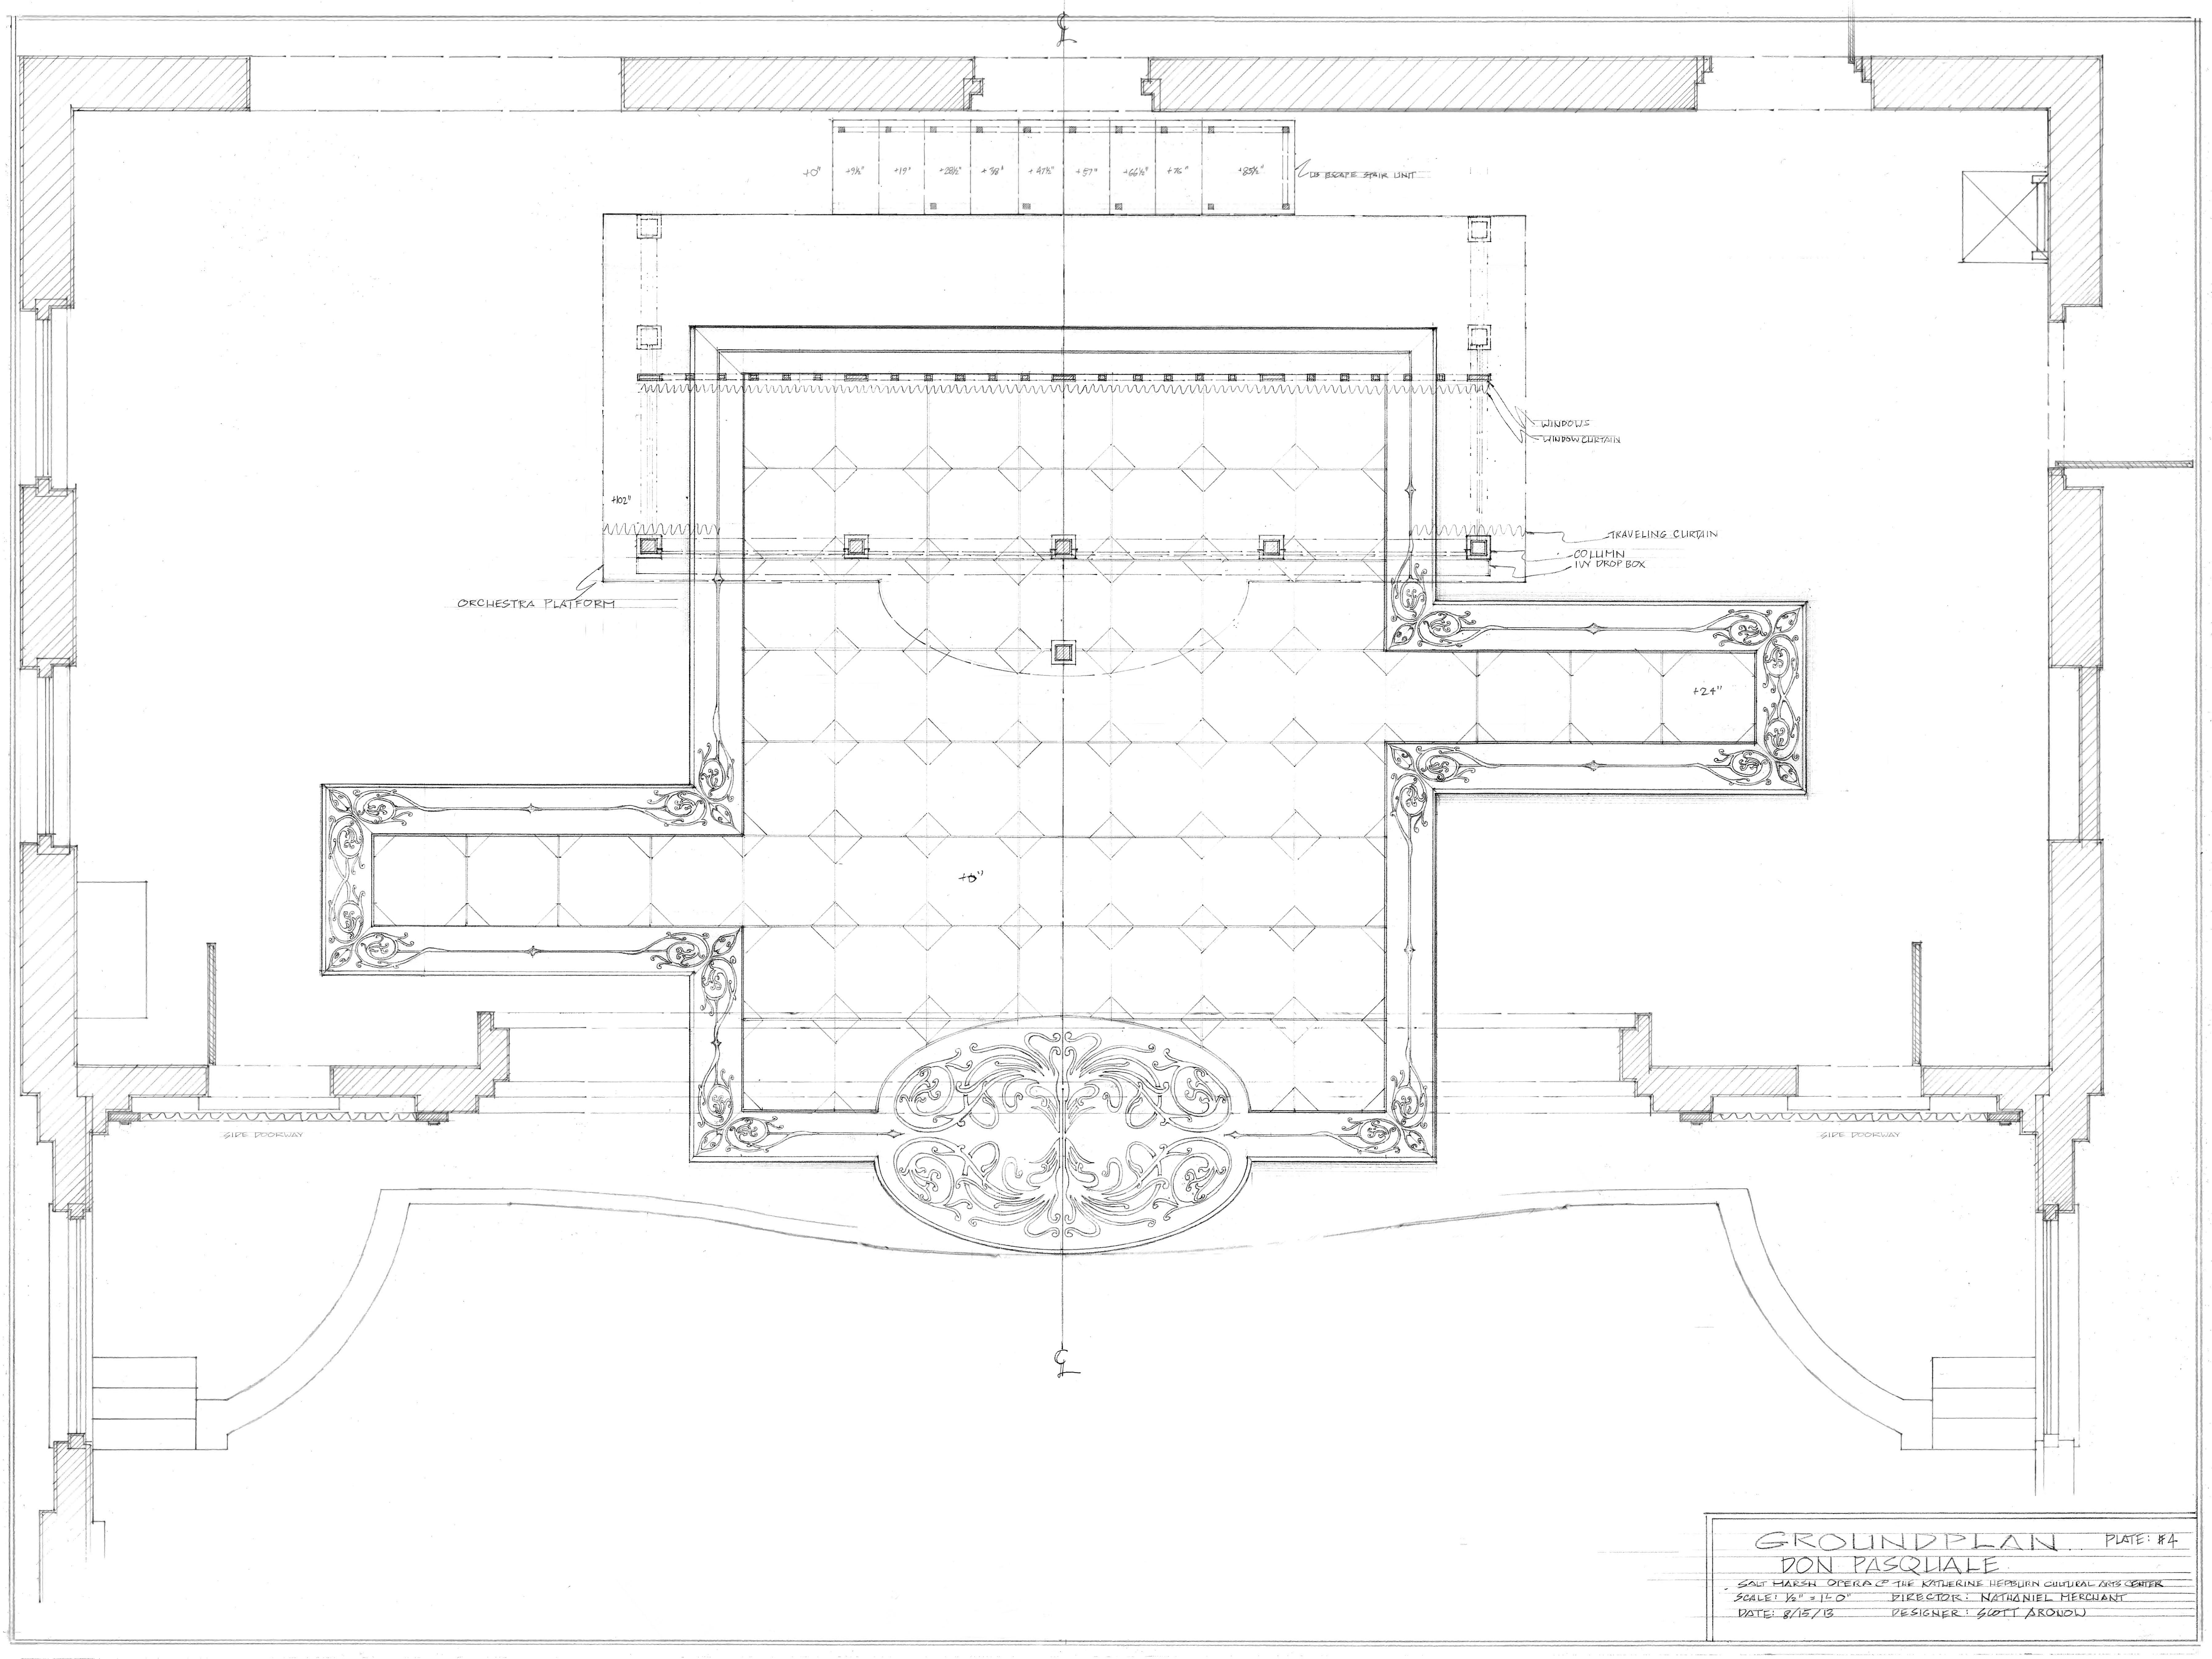 Plate #4. Groundplan, CT